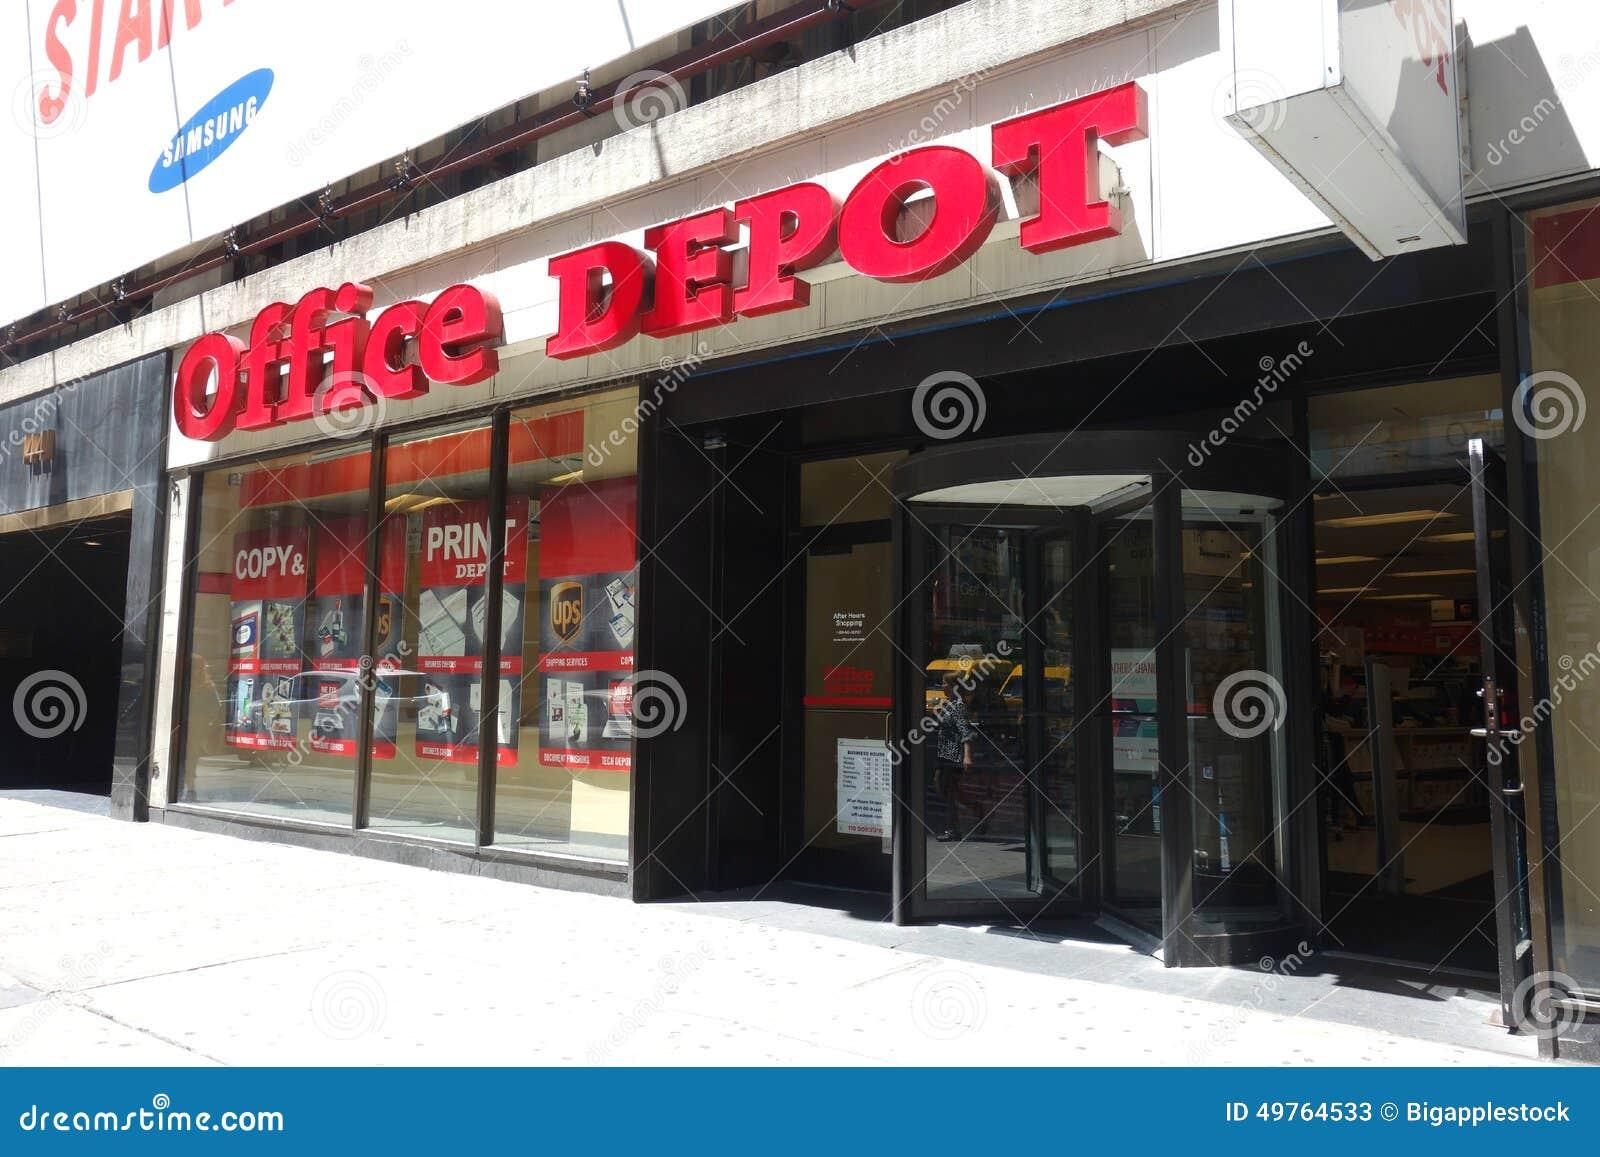 office depot editorial stock photo image 49764533. Black Bedroom Furniture Sets. Home Design Ideas